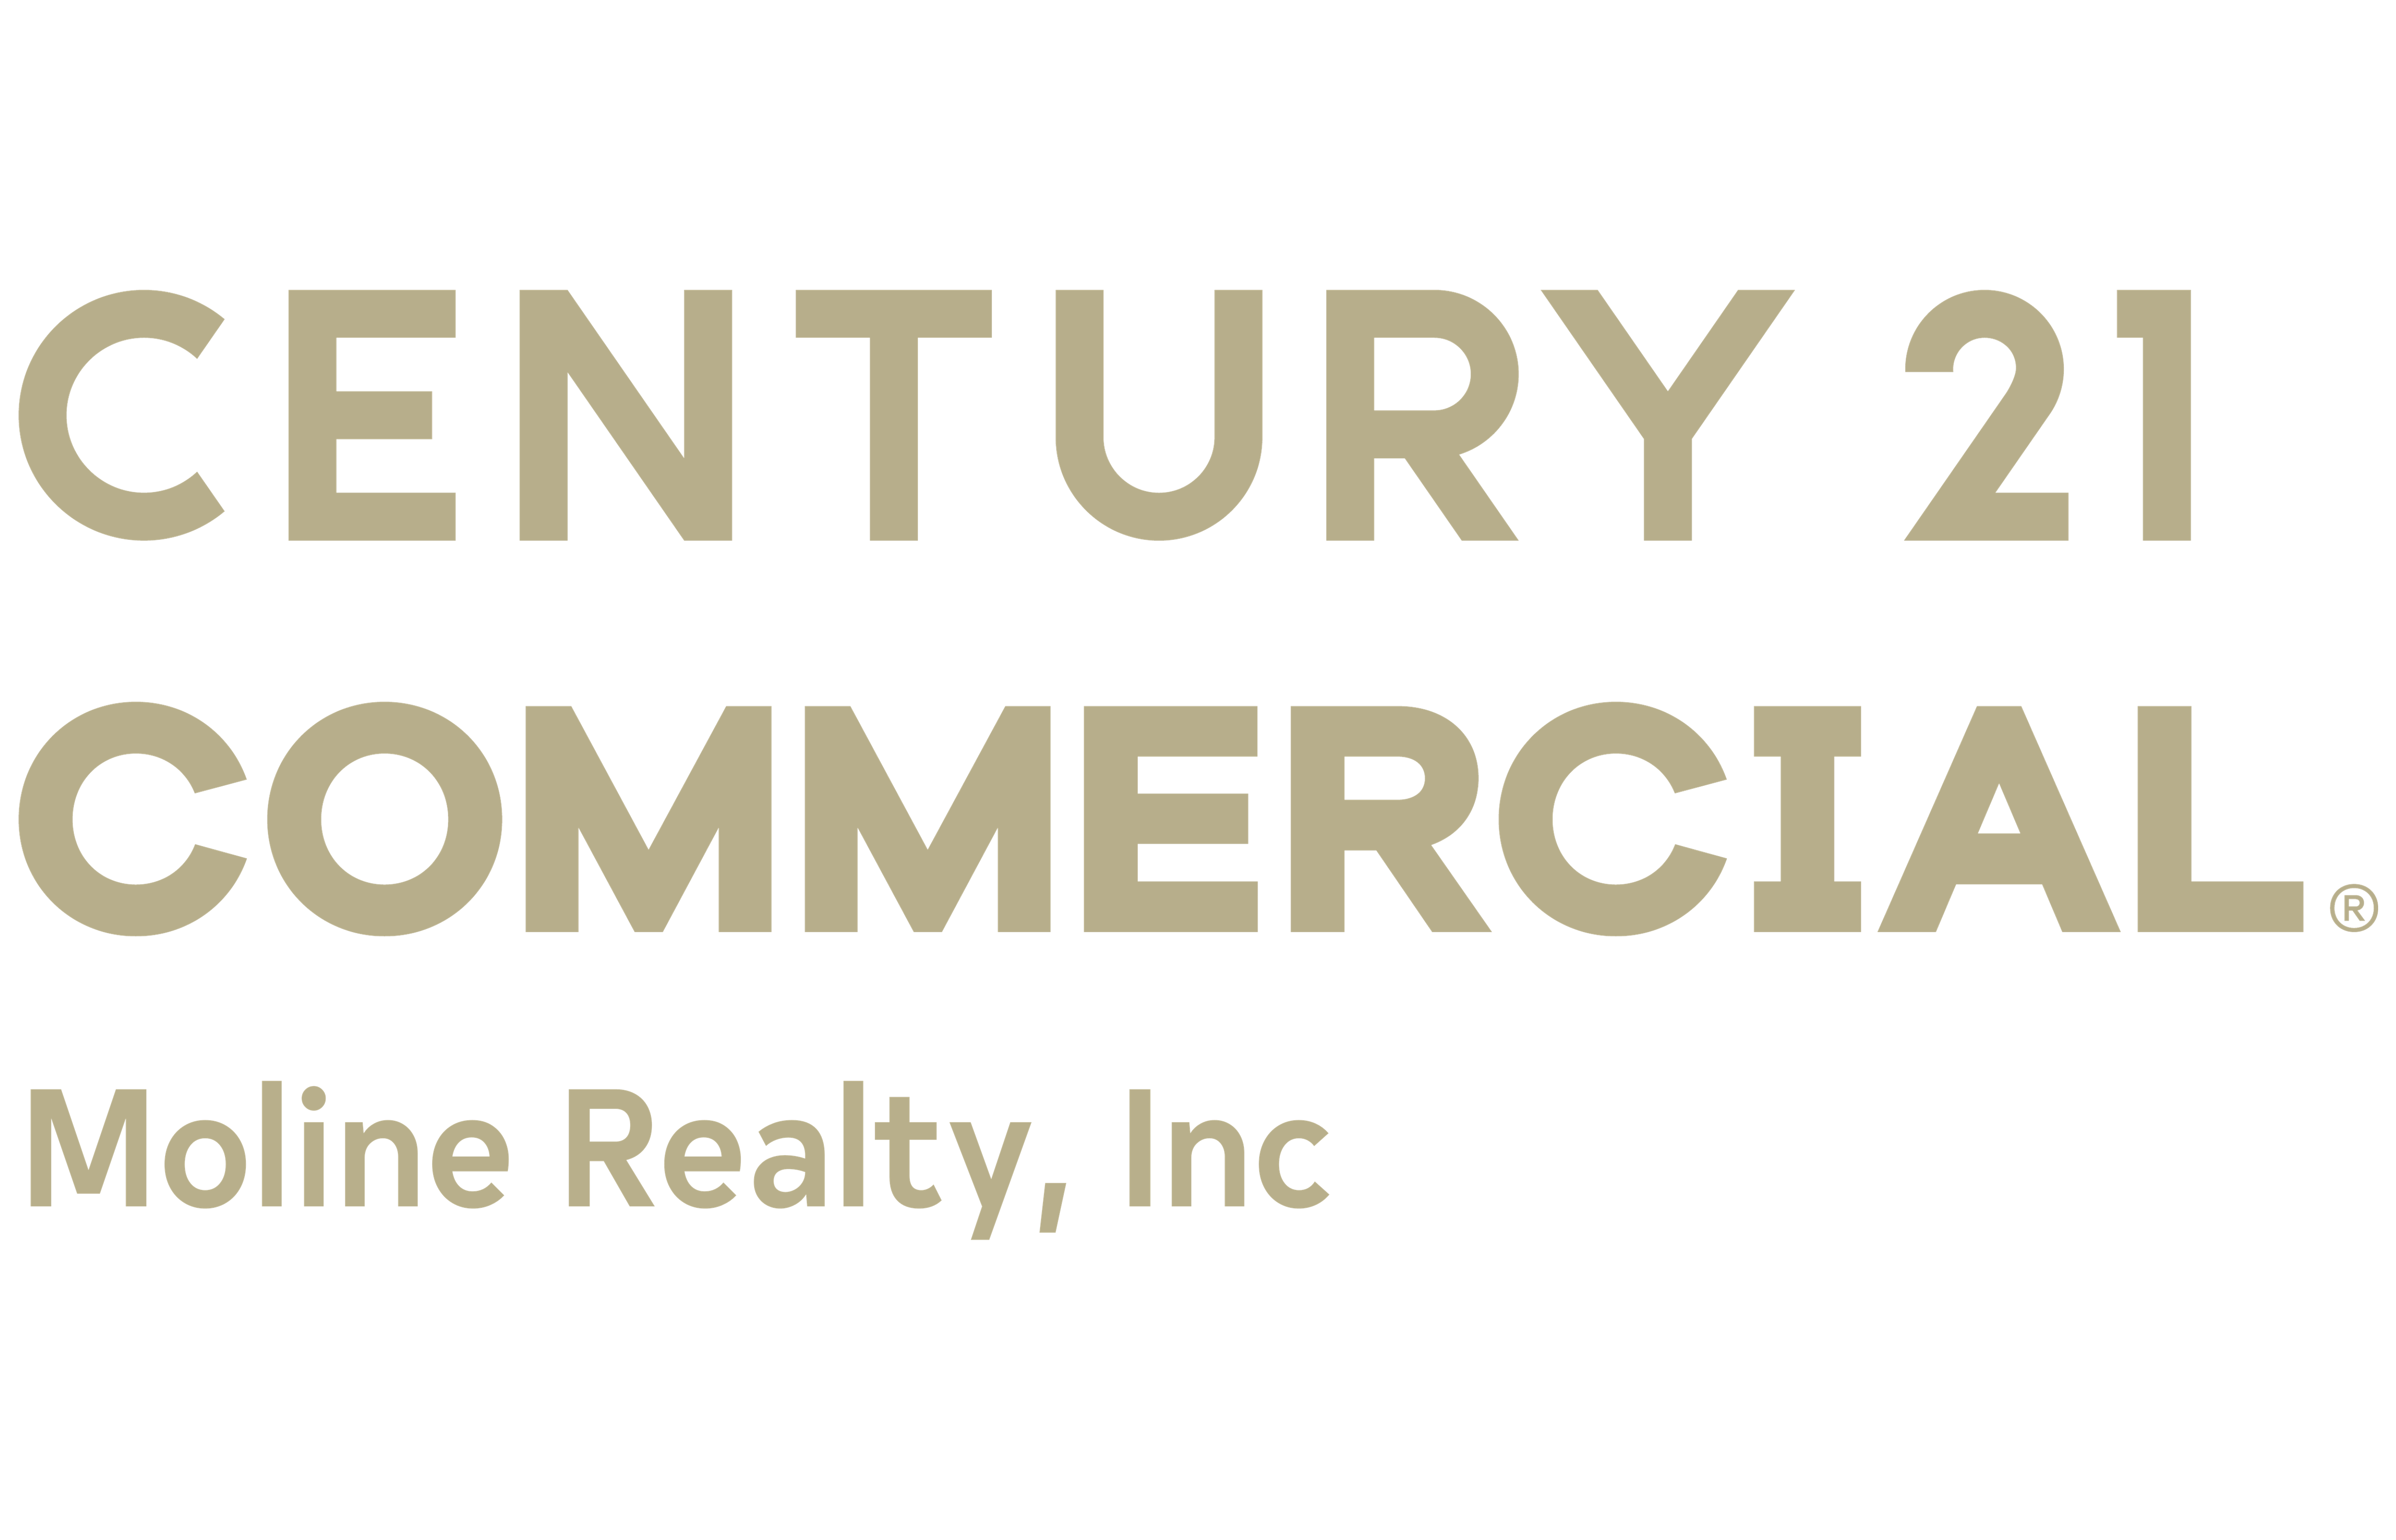 CENTURY 21 Moline Realty, Inc